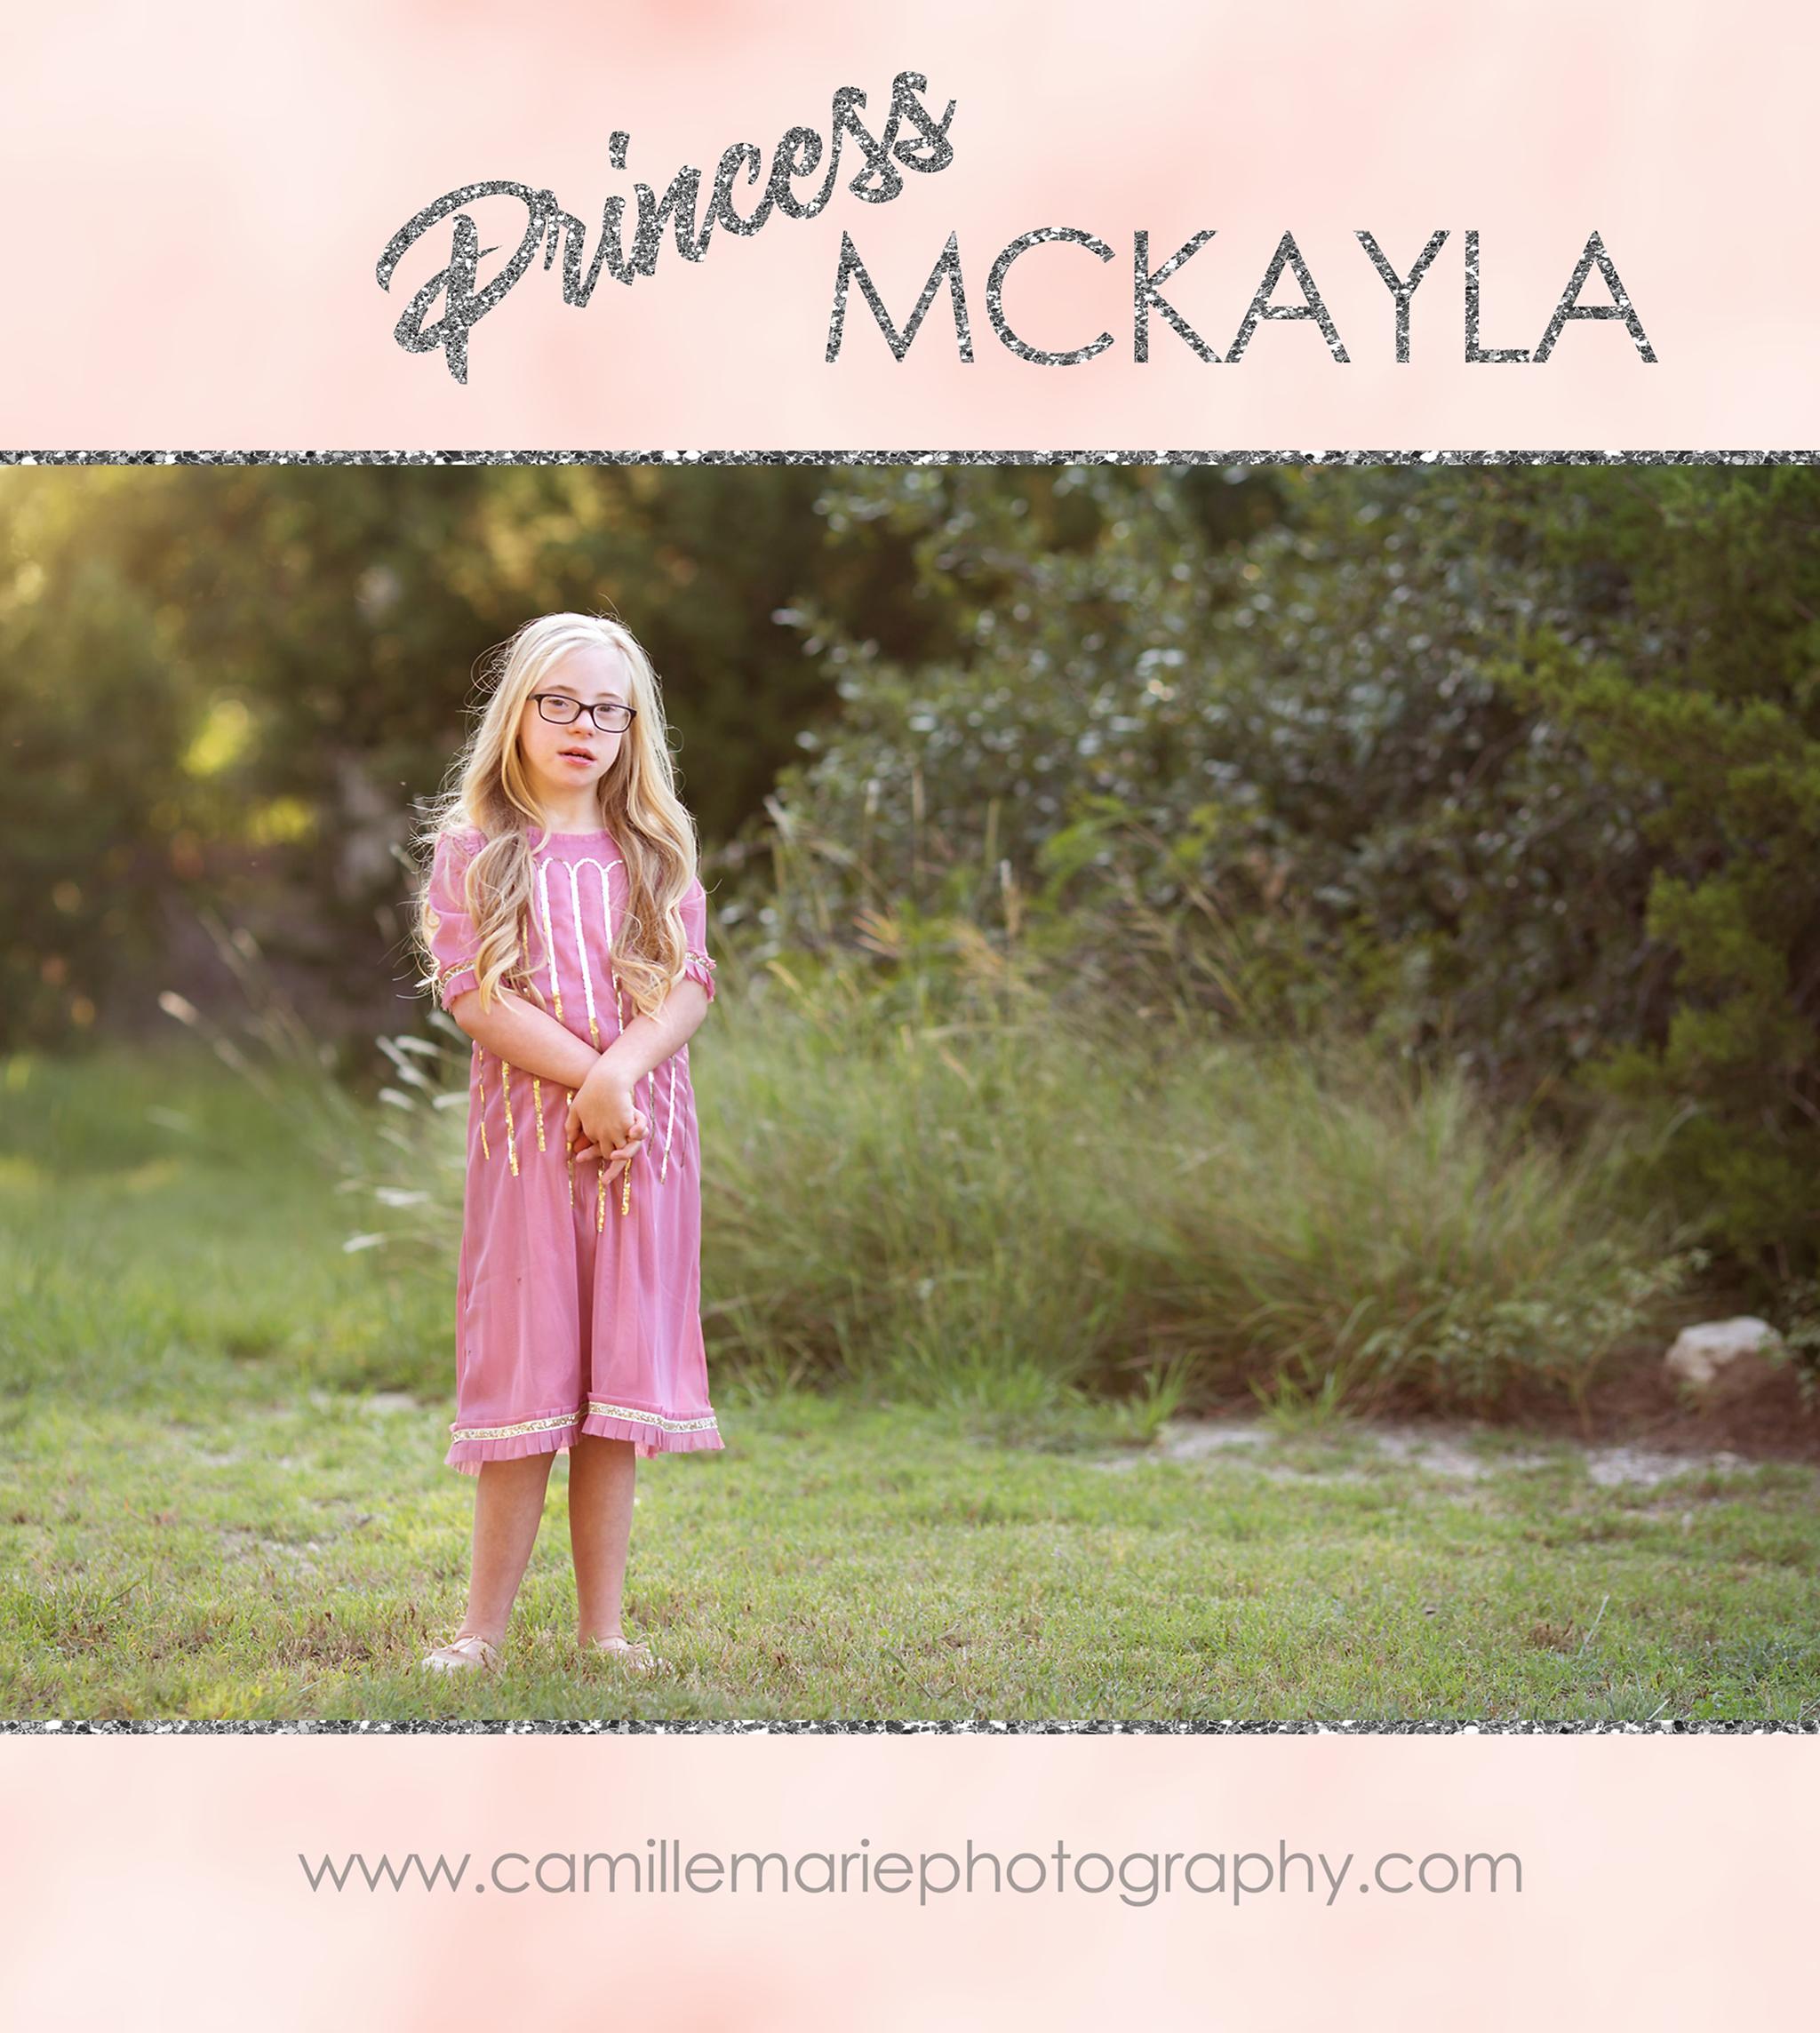 Mckayla.png